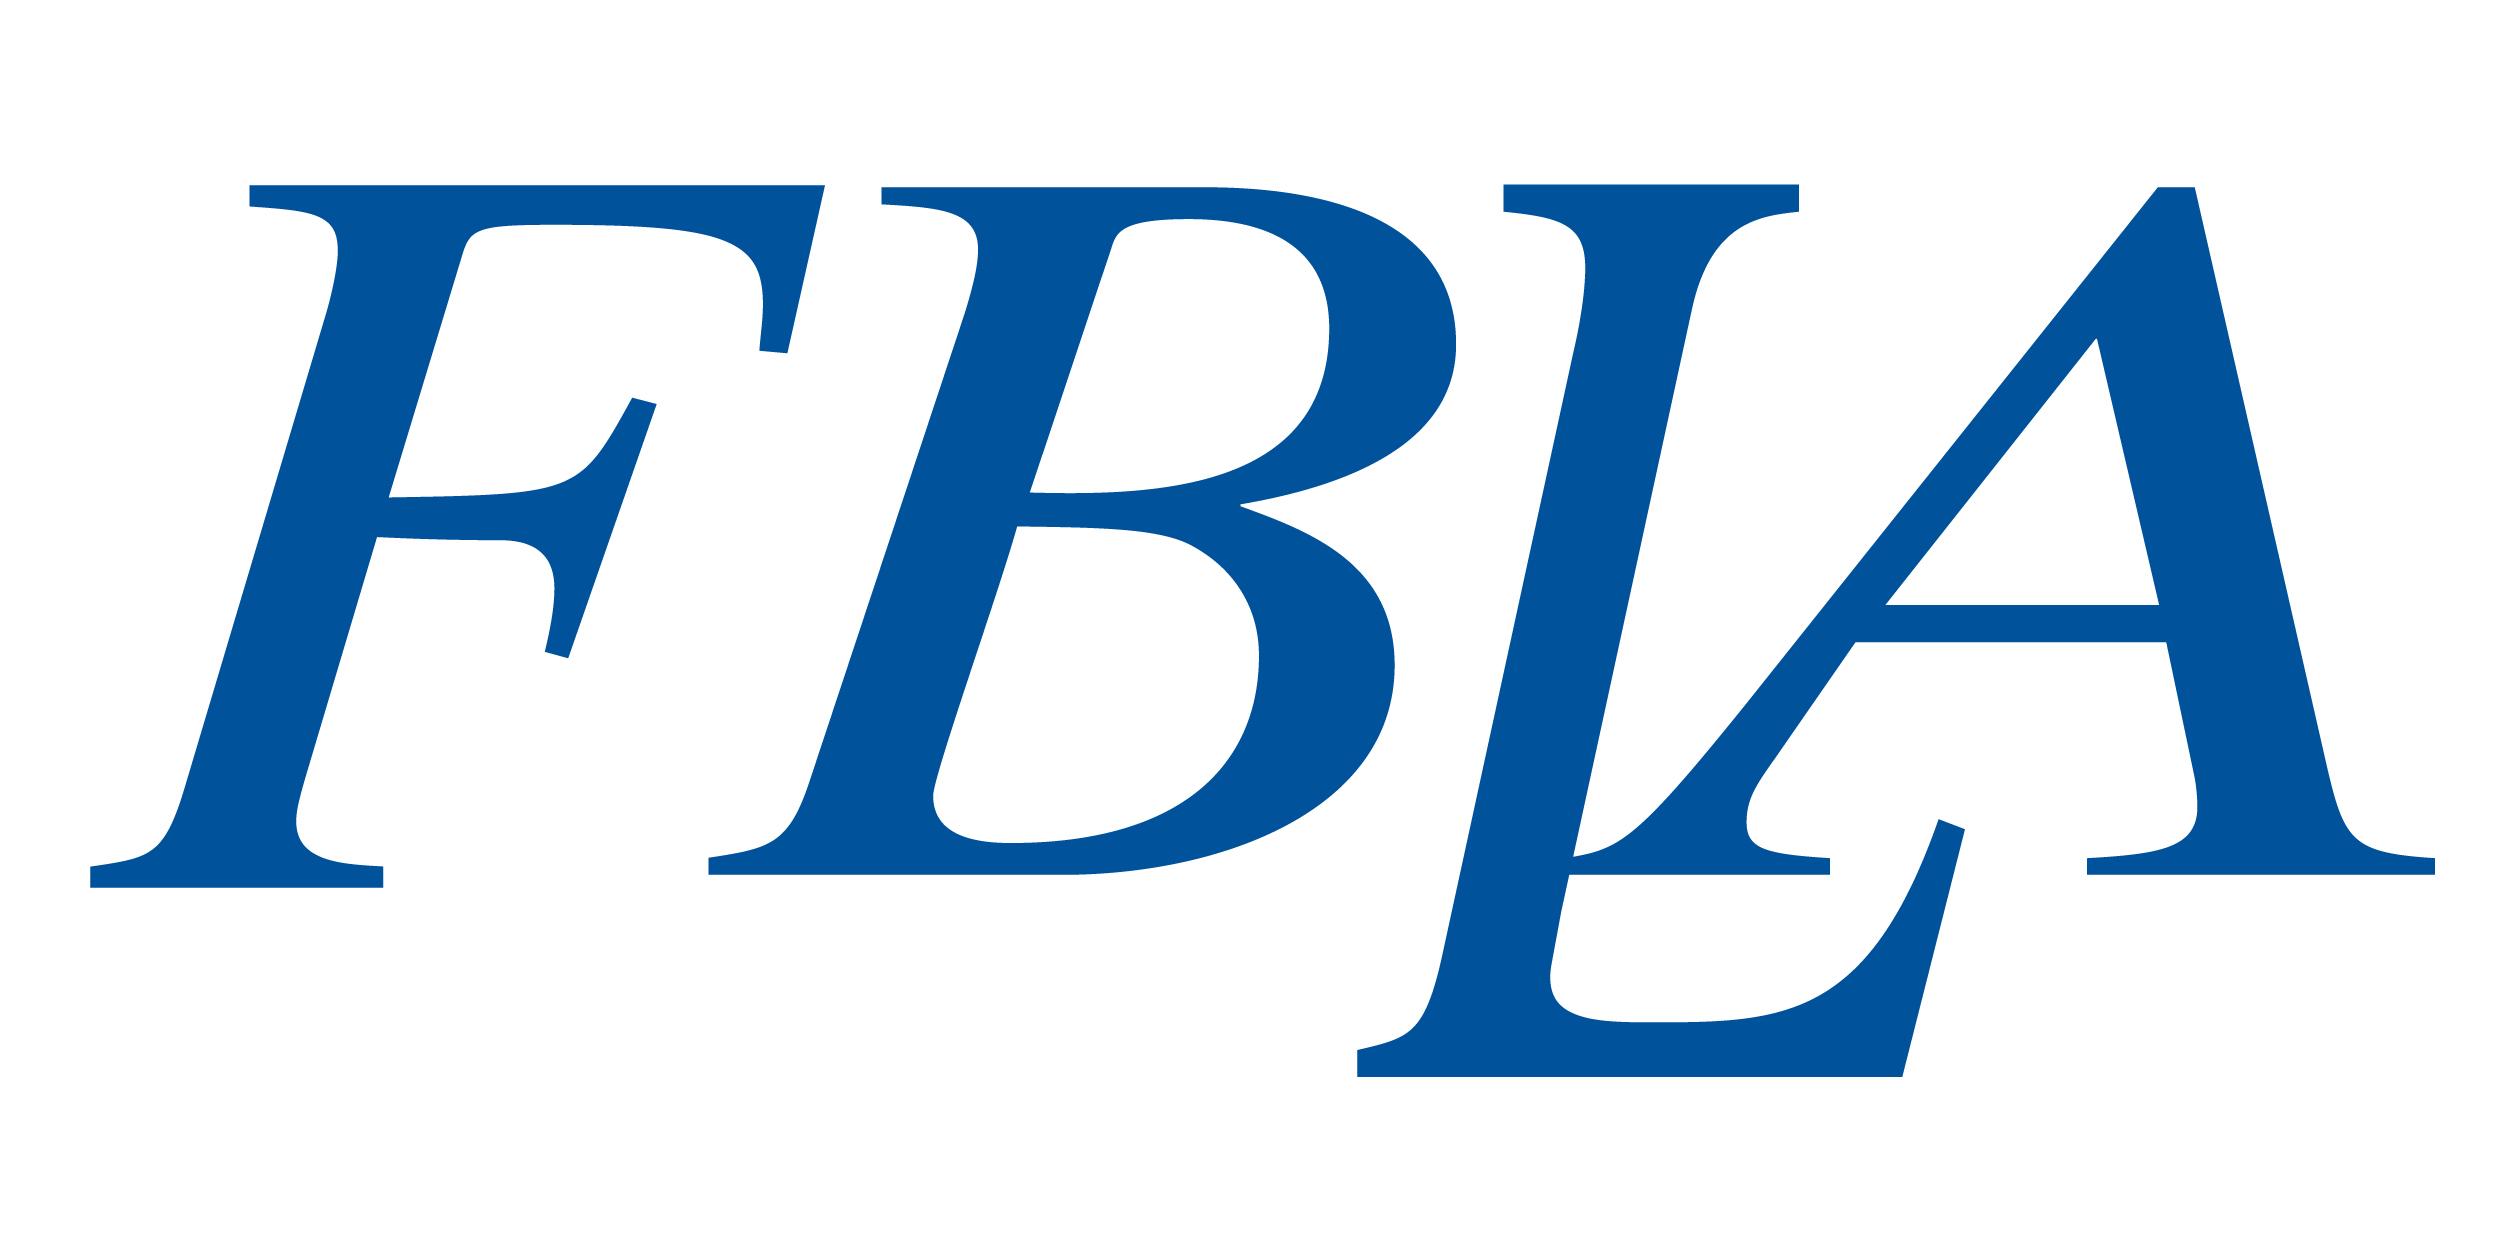 Fbla Logo Fbla Symbol Meaning History And Evolution